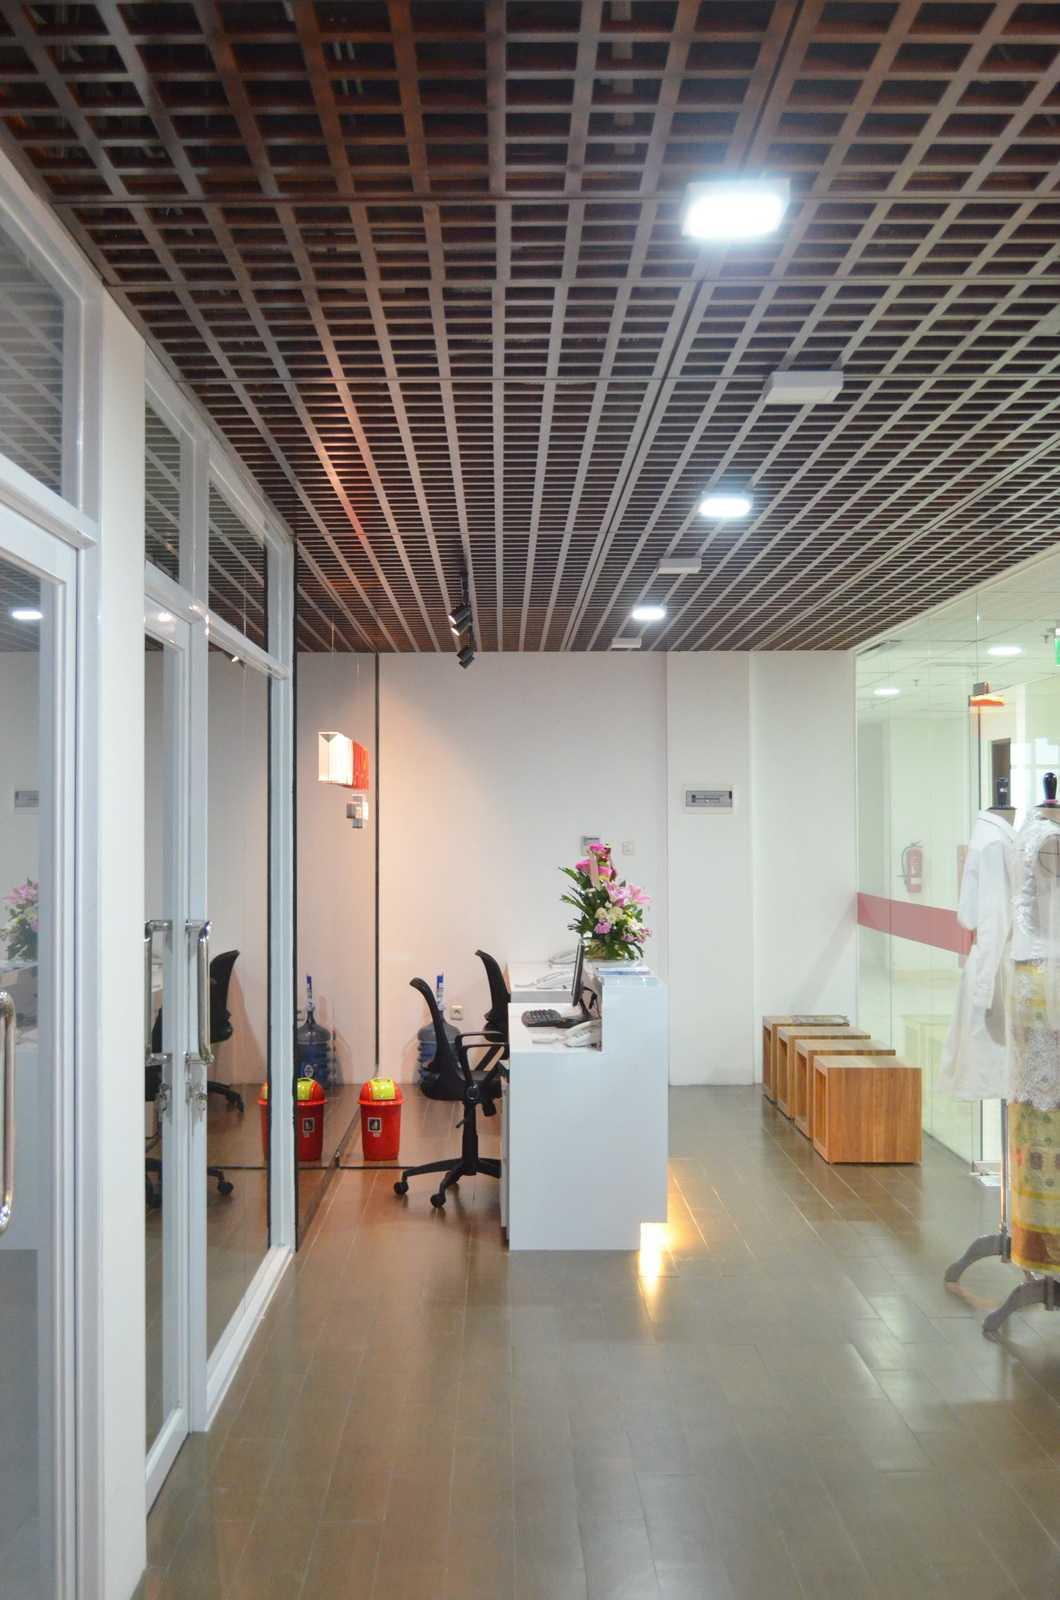 X3M Architects Esmod Creative Hub Kota Tgr. Sel., Kota Tangerang Selatan, Banten, Indonesia Kota Tgr. Sel., Kota Tangerang Selatan, Banten, Indonesia X3M-Architects-Esmod-Creative-Hub Modern  56027